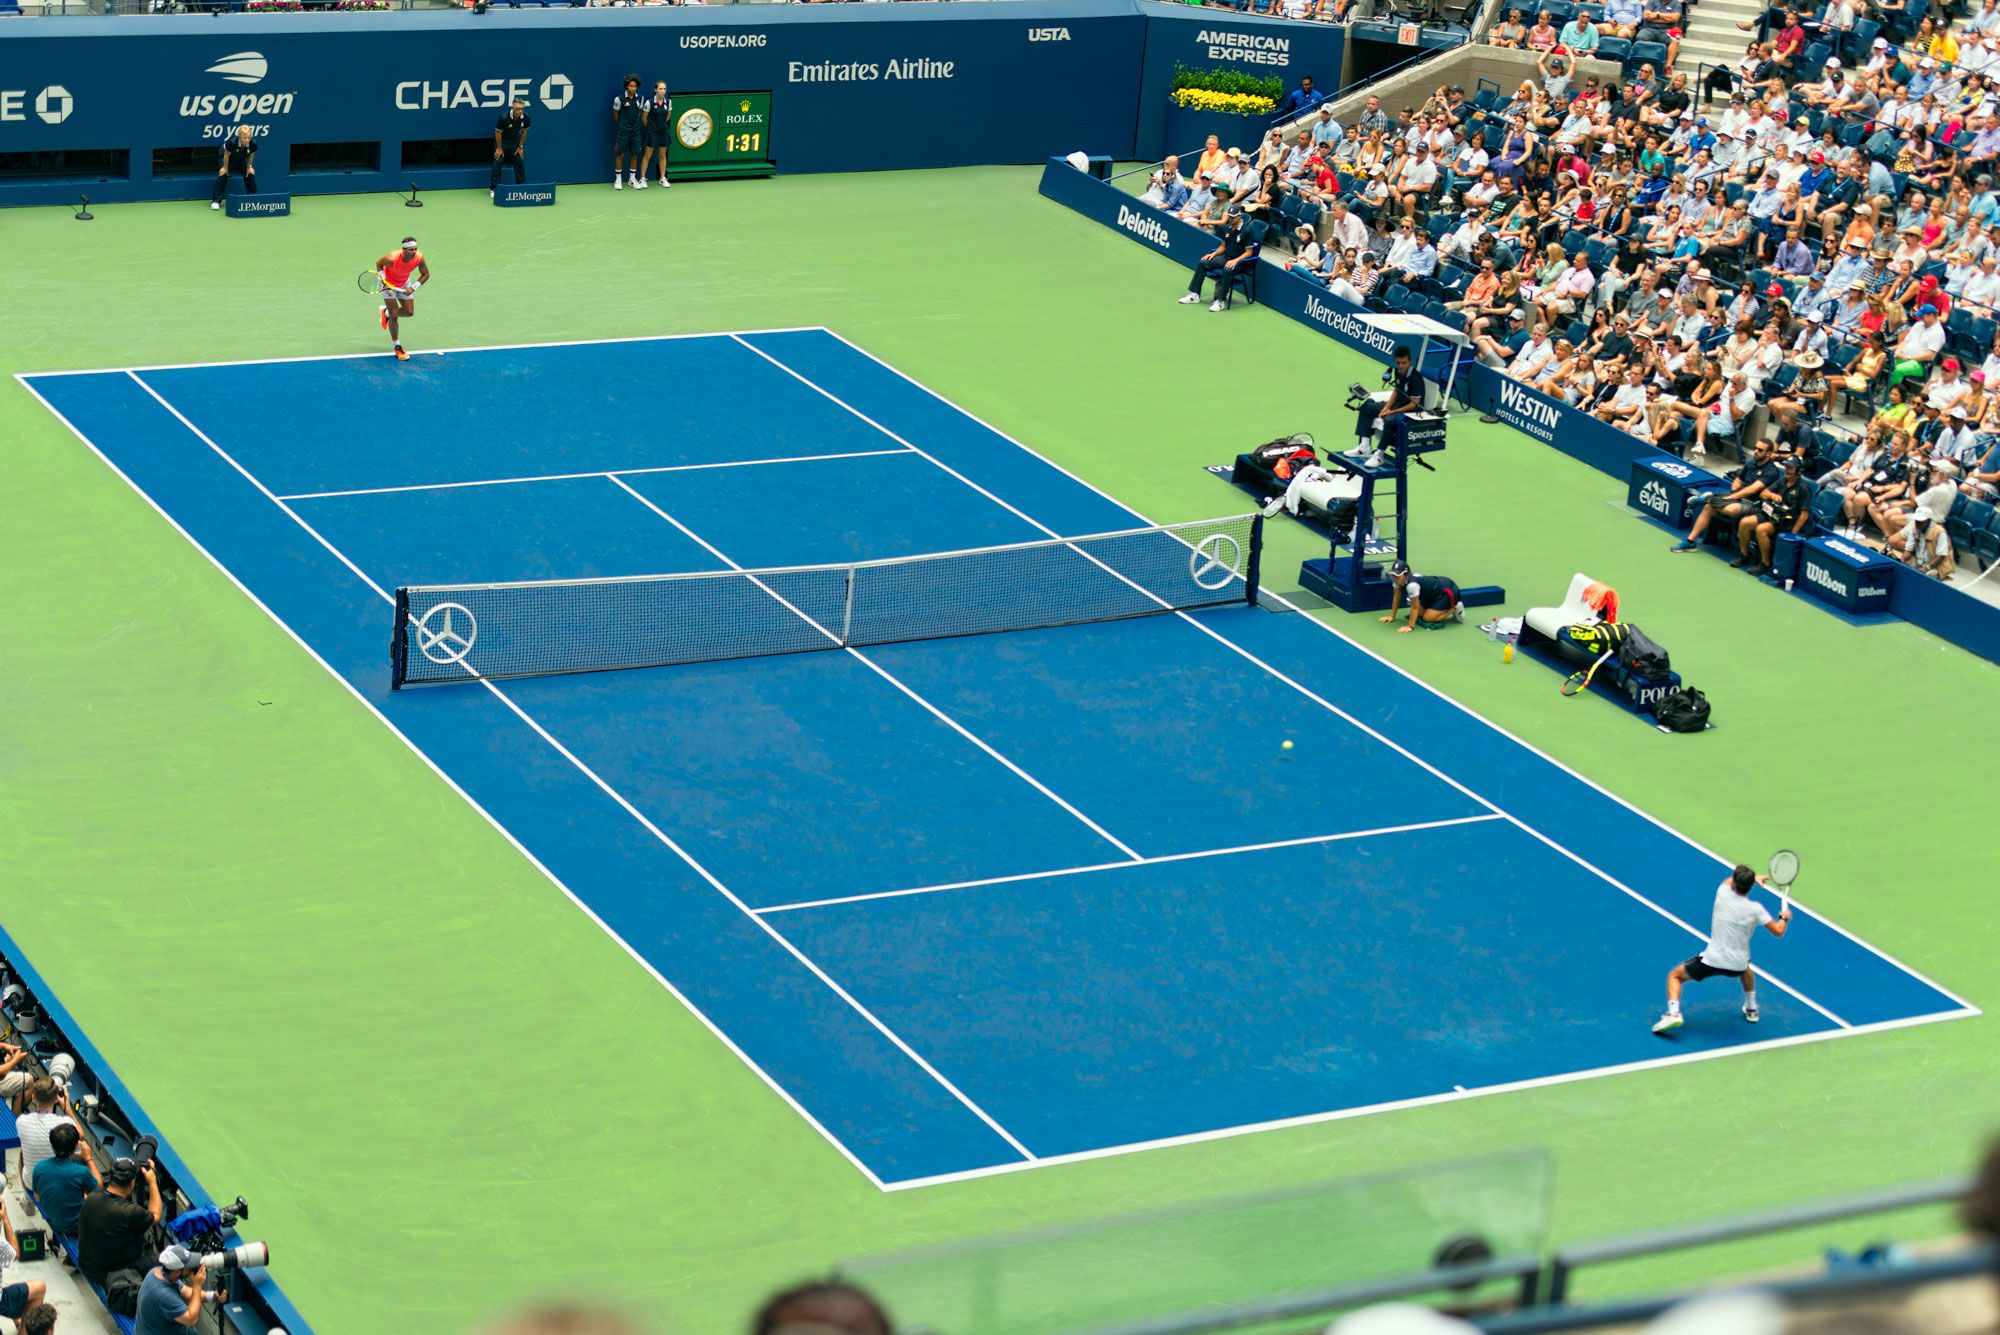 Nadal vs Basilashvili, round of 16 at the US Open